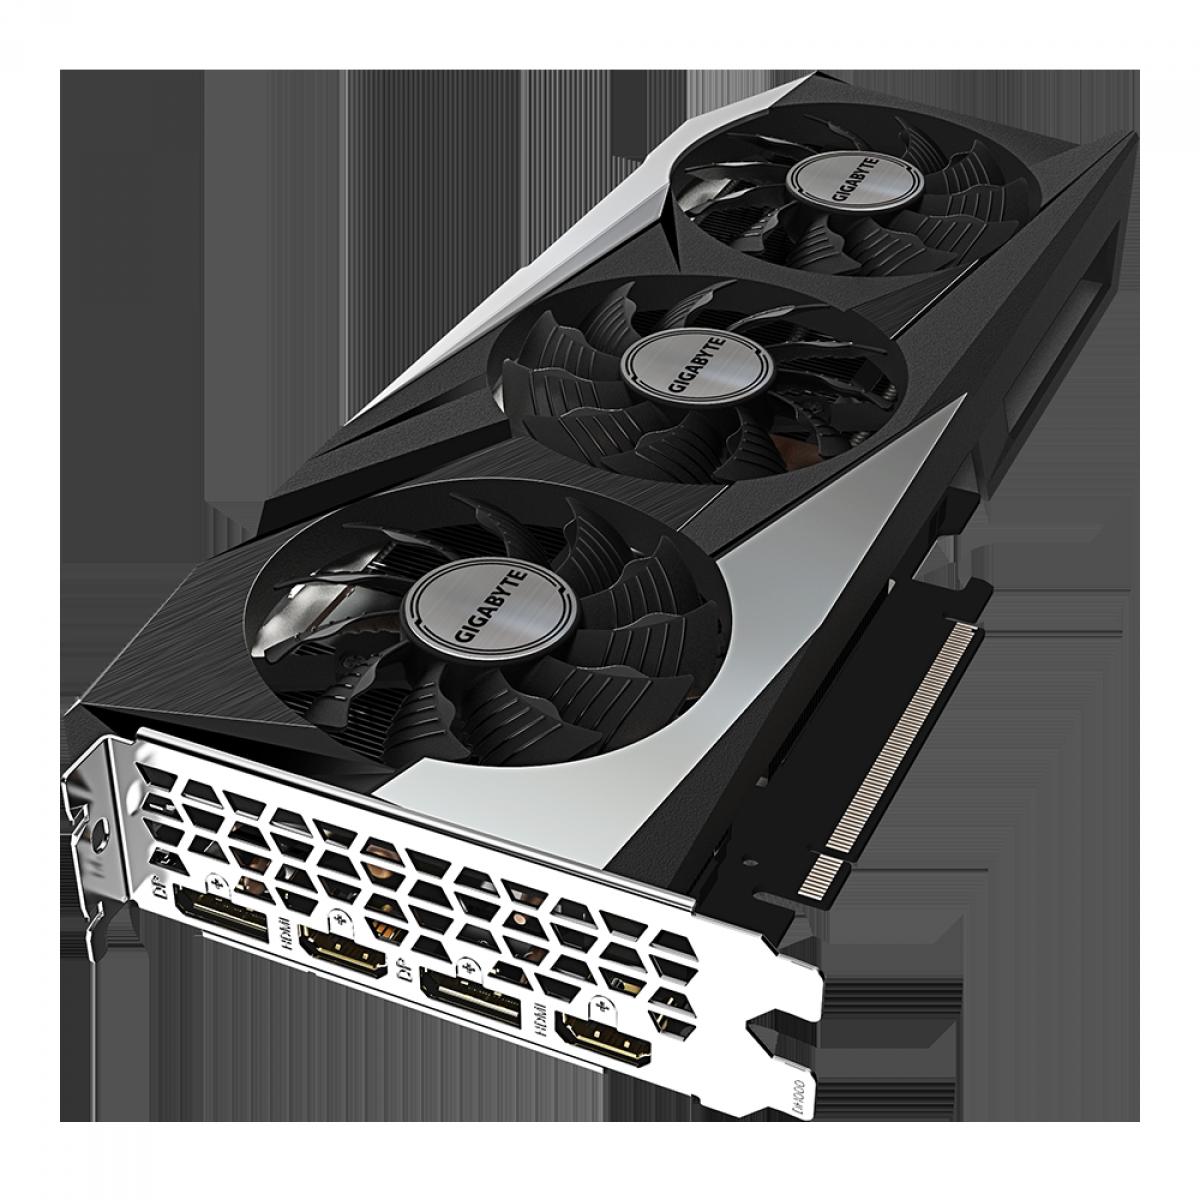 Placa de Vídeo Gigabyte GeForce RTX 3060 Gaming OC, LHR, 12GB, GDDR6, DLSS, Ray Tracing, GV-N3060GAMING OC-12GD